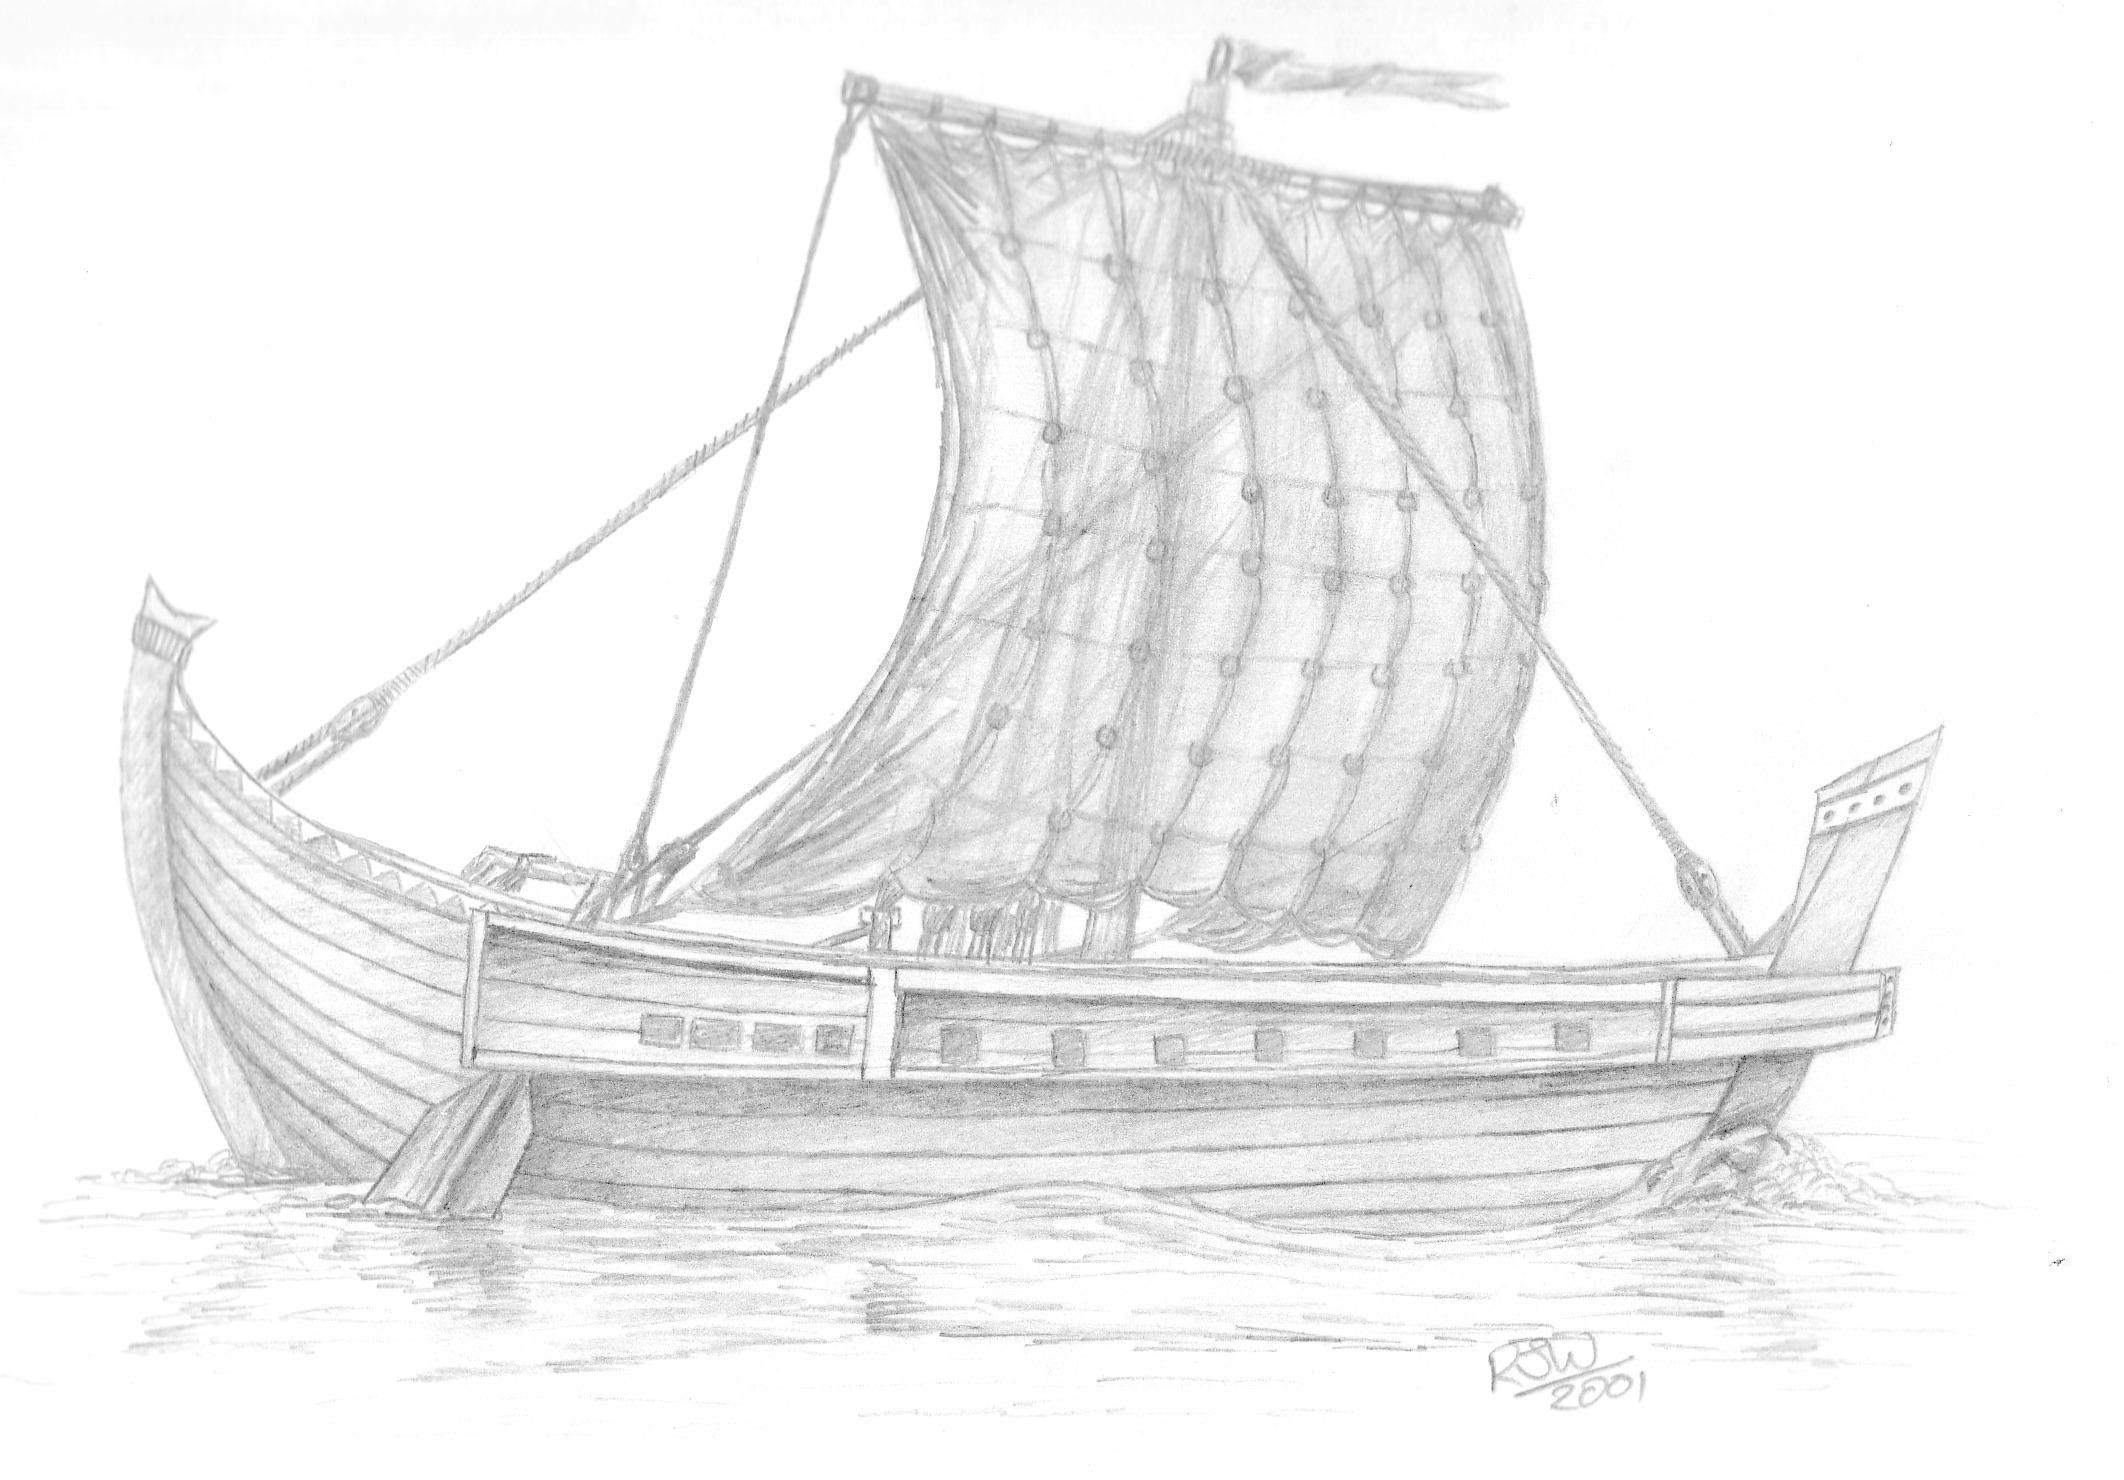 Artistic impression of a Roman period Sailing Ship